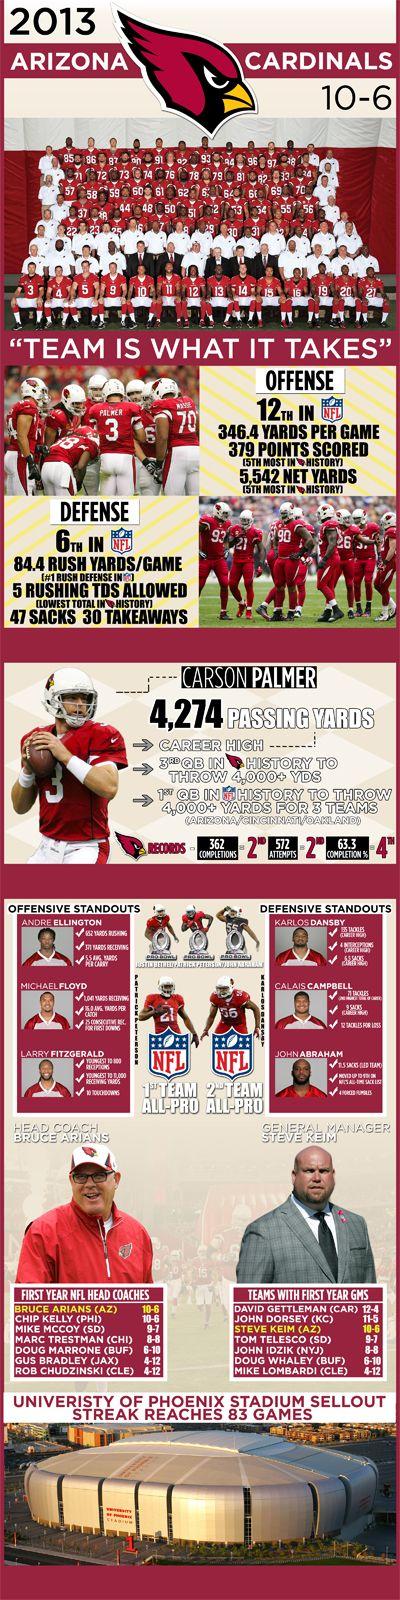 Arizona Cardinals 2013 Season Infographic